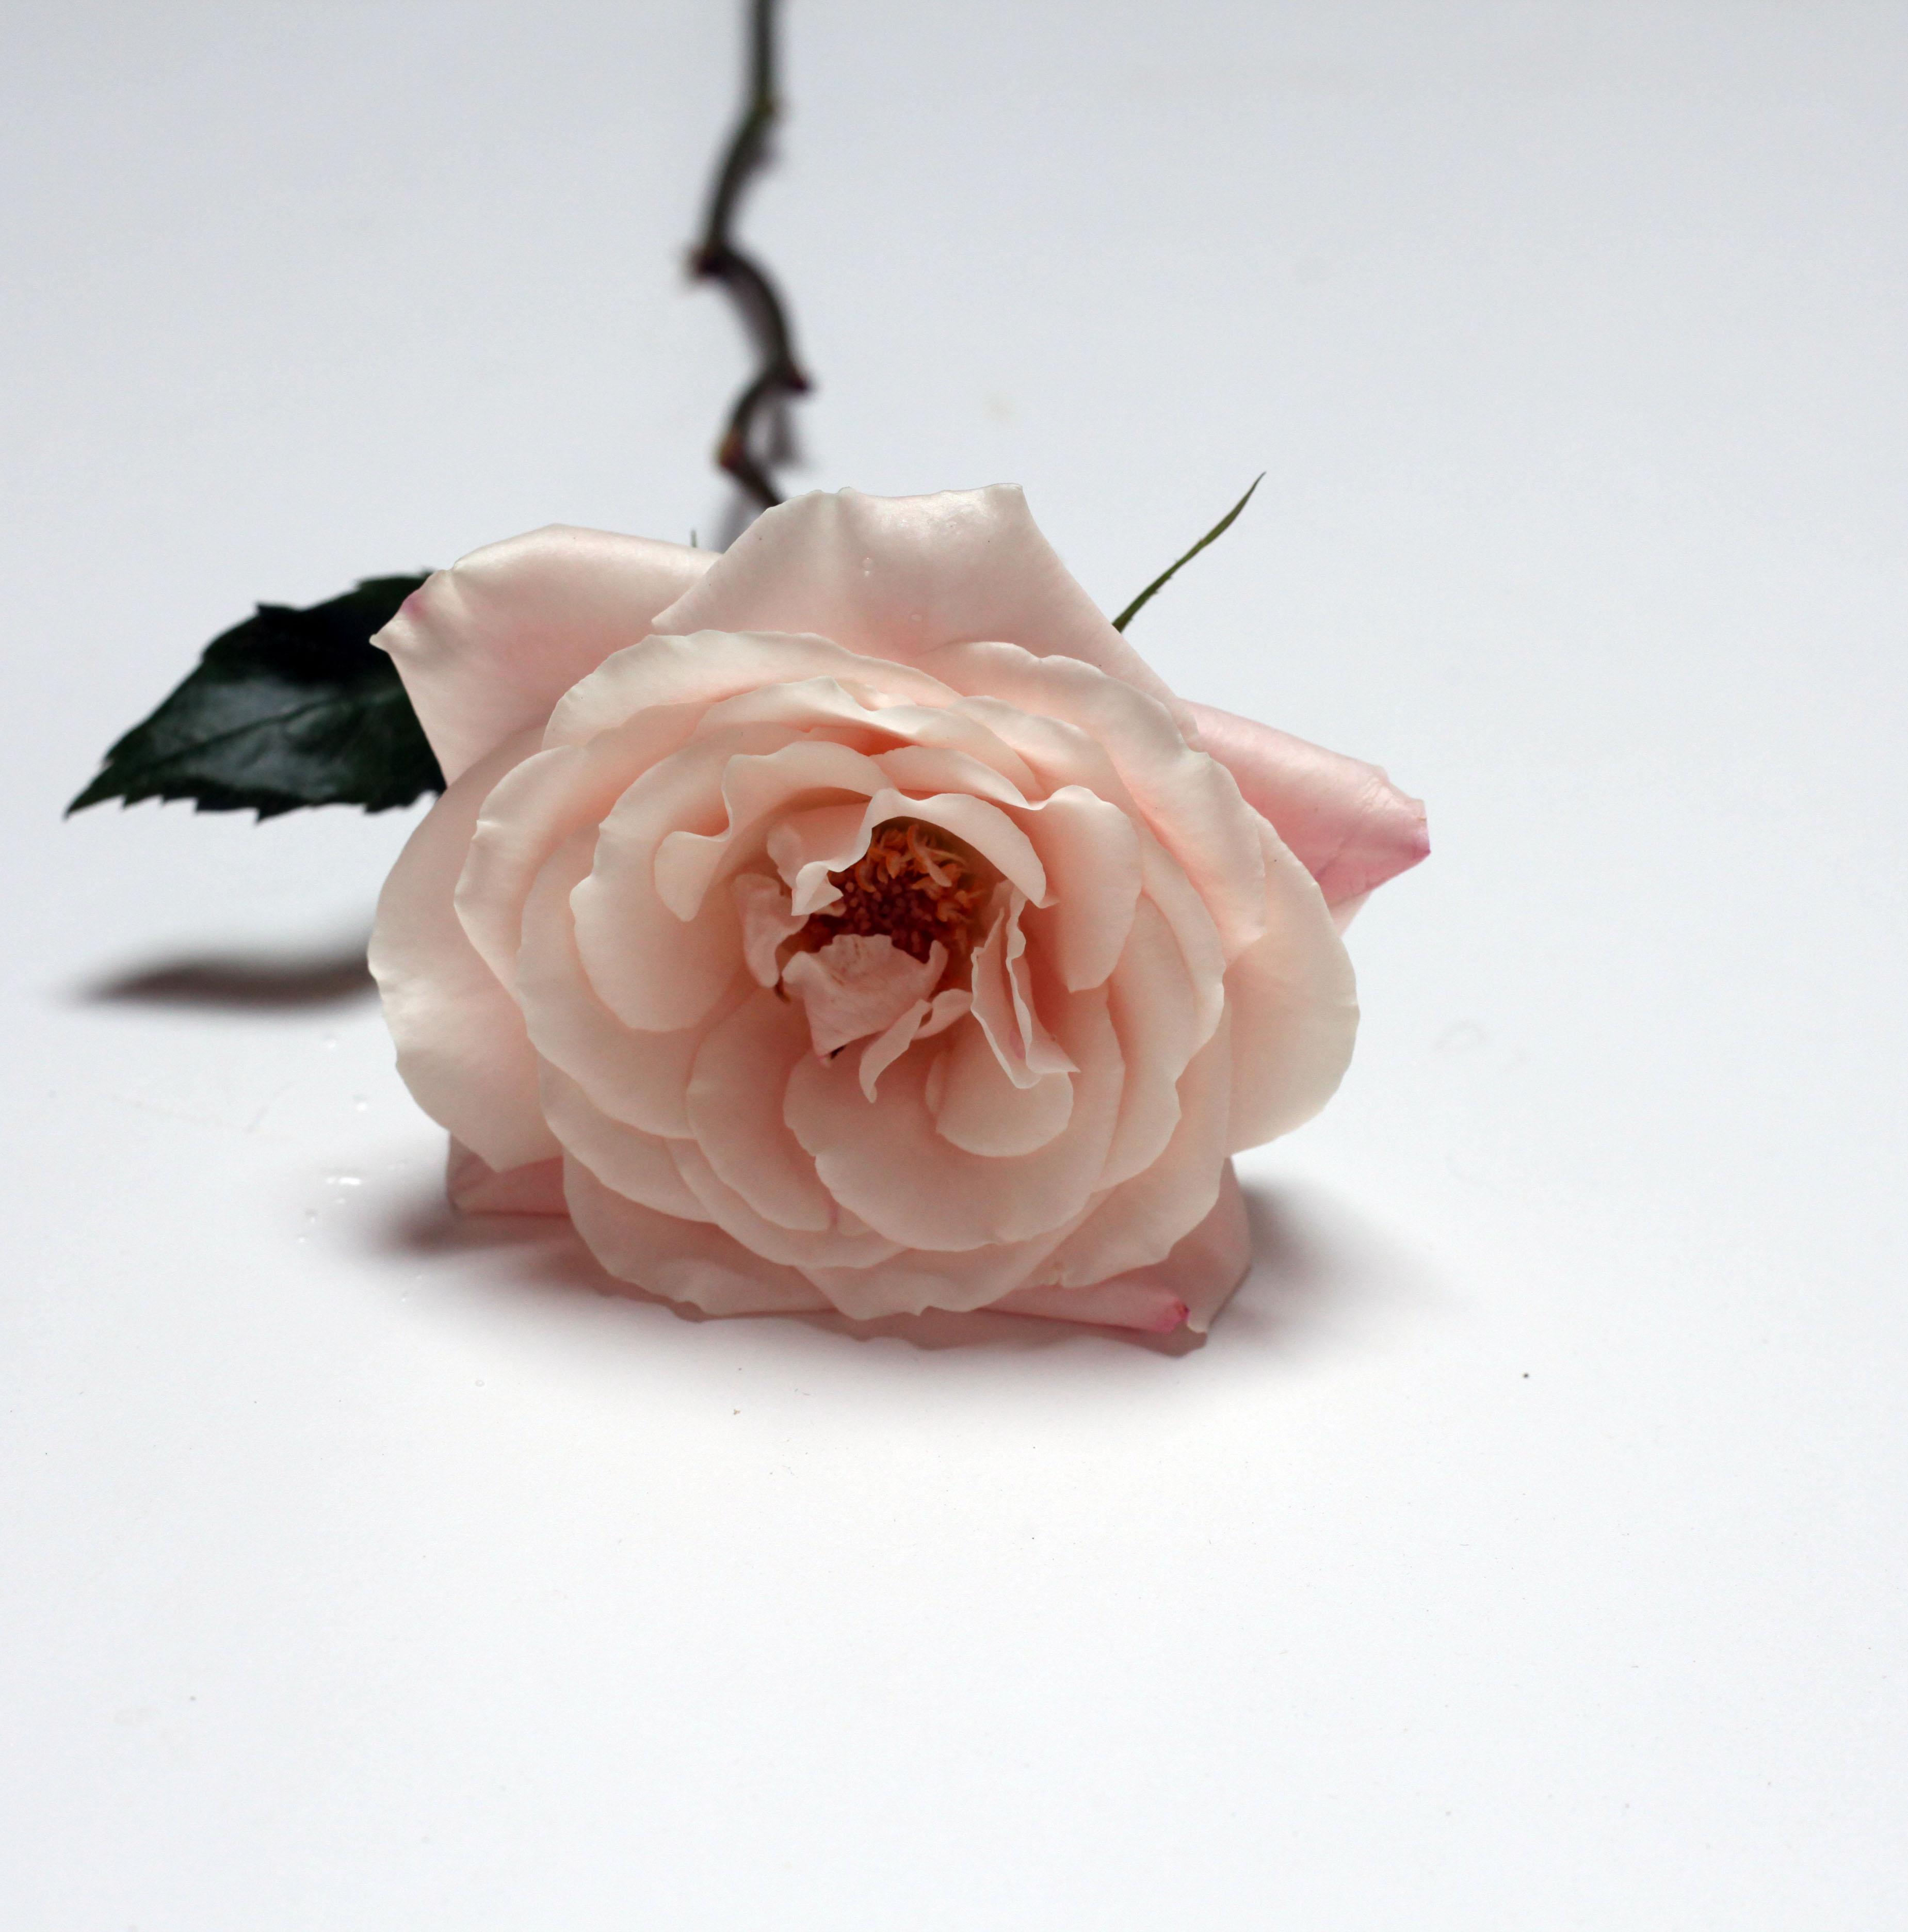 prince jardinier garden rose-poppies and posies